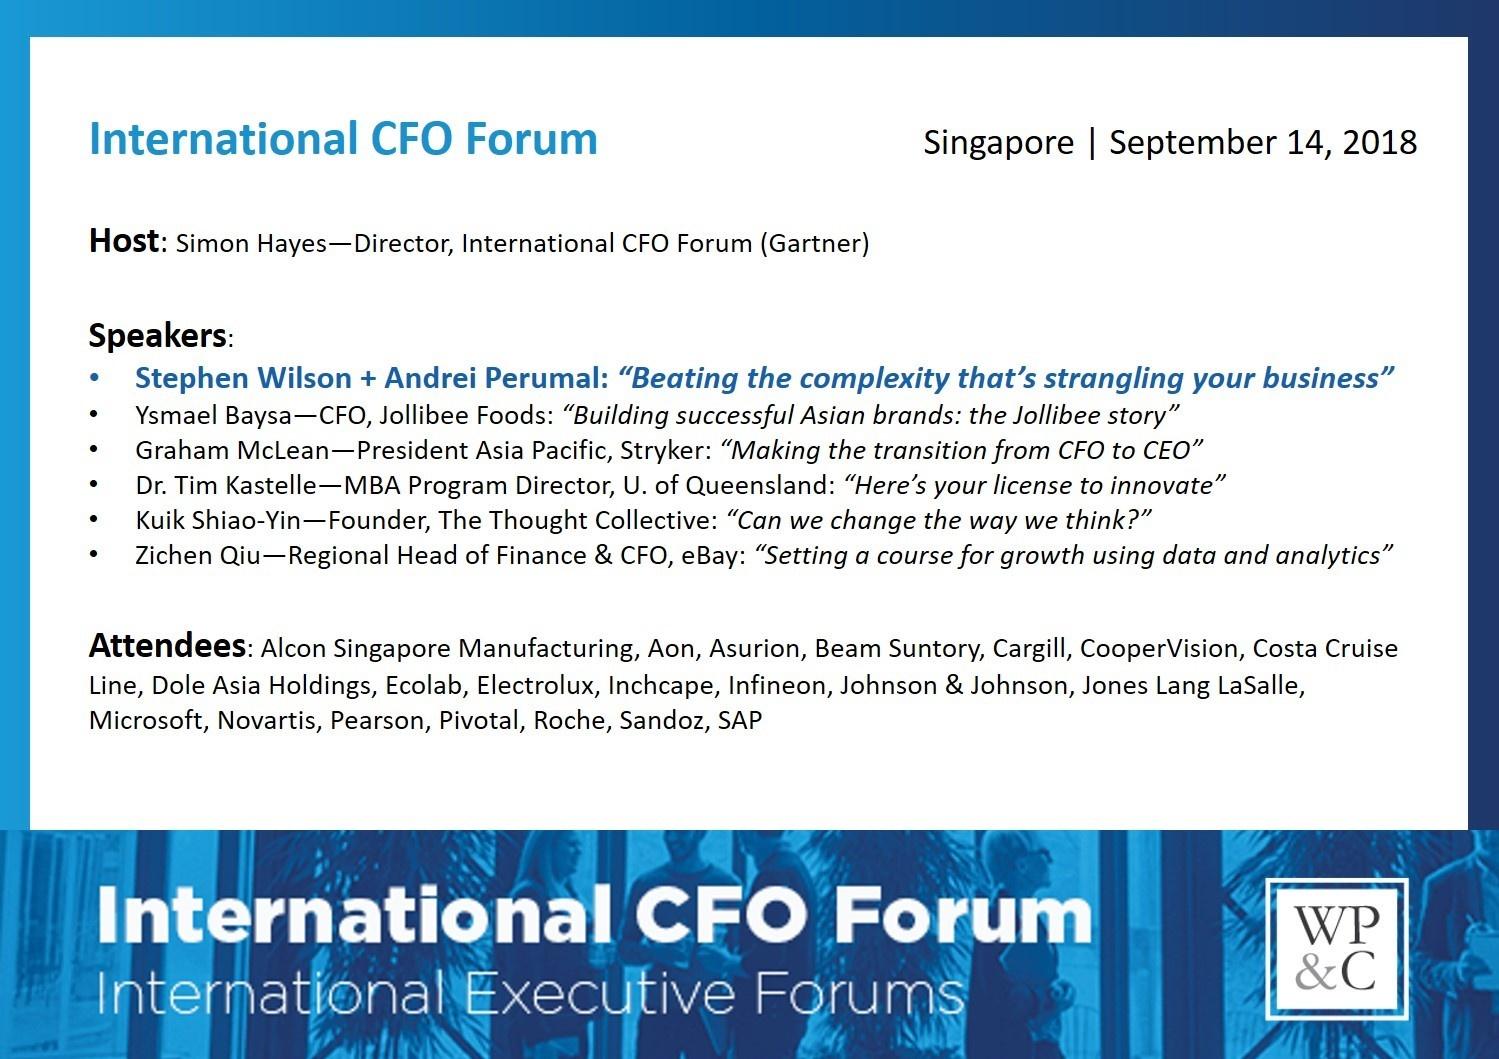 180913 - SWAP at International CFO Forum (2)